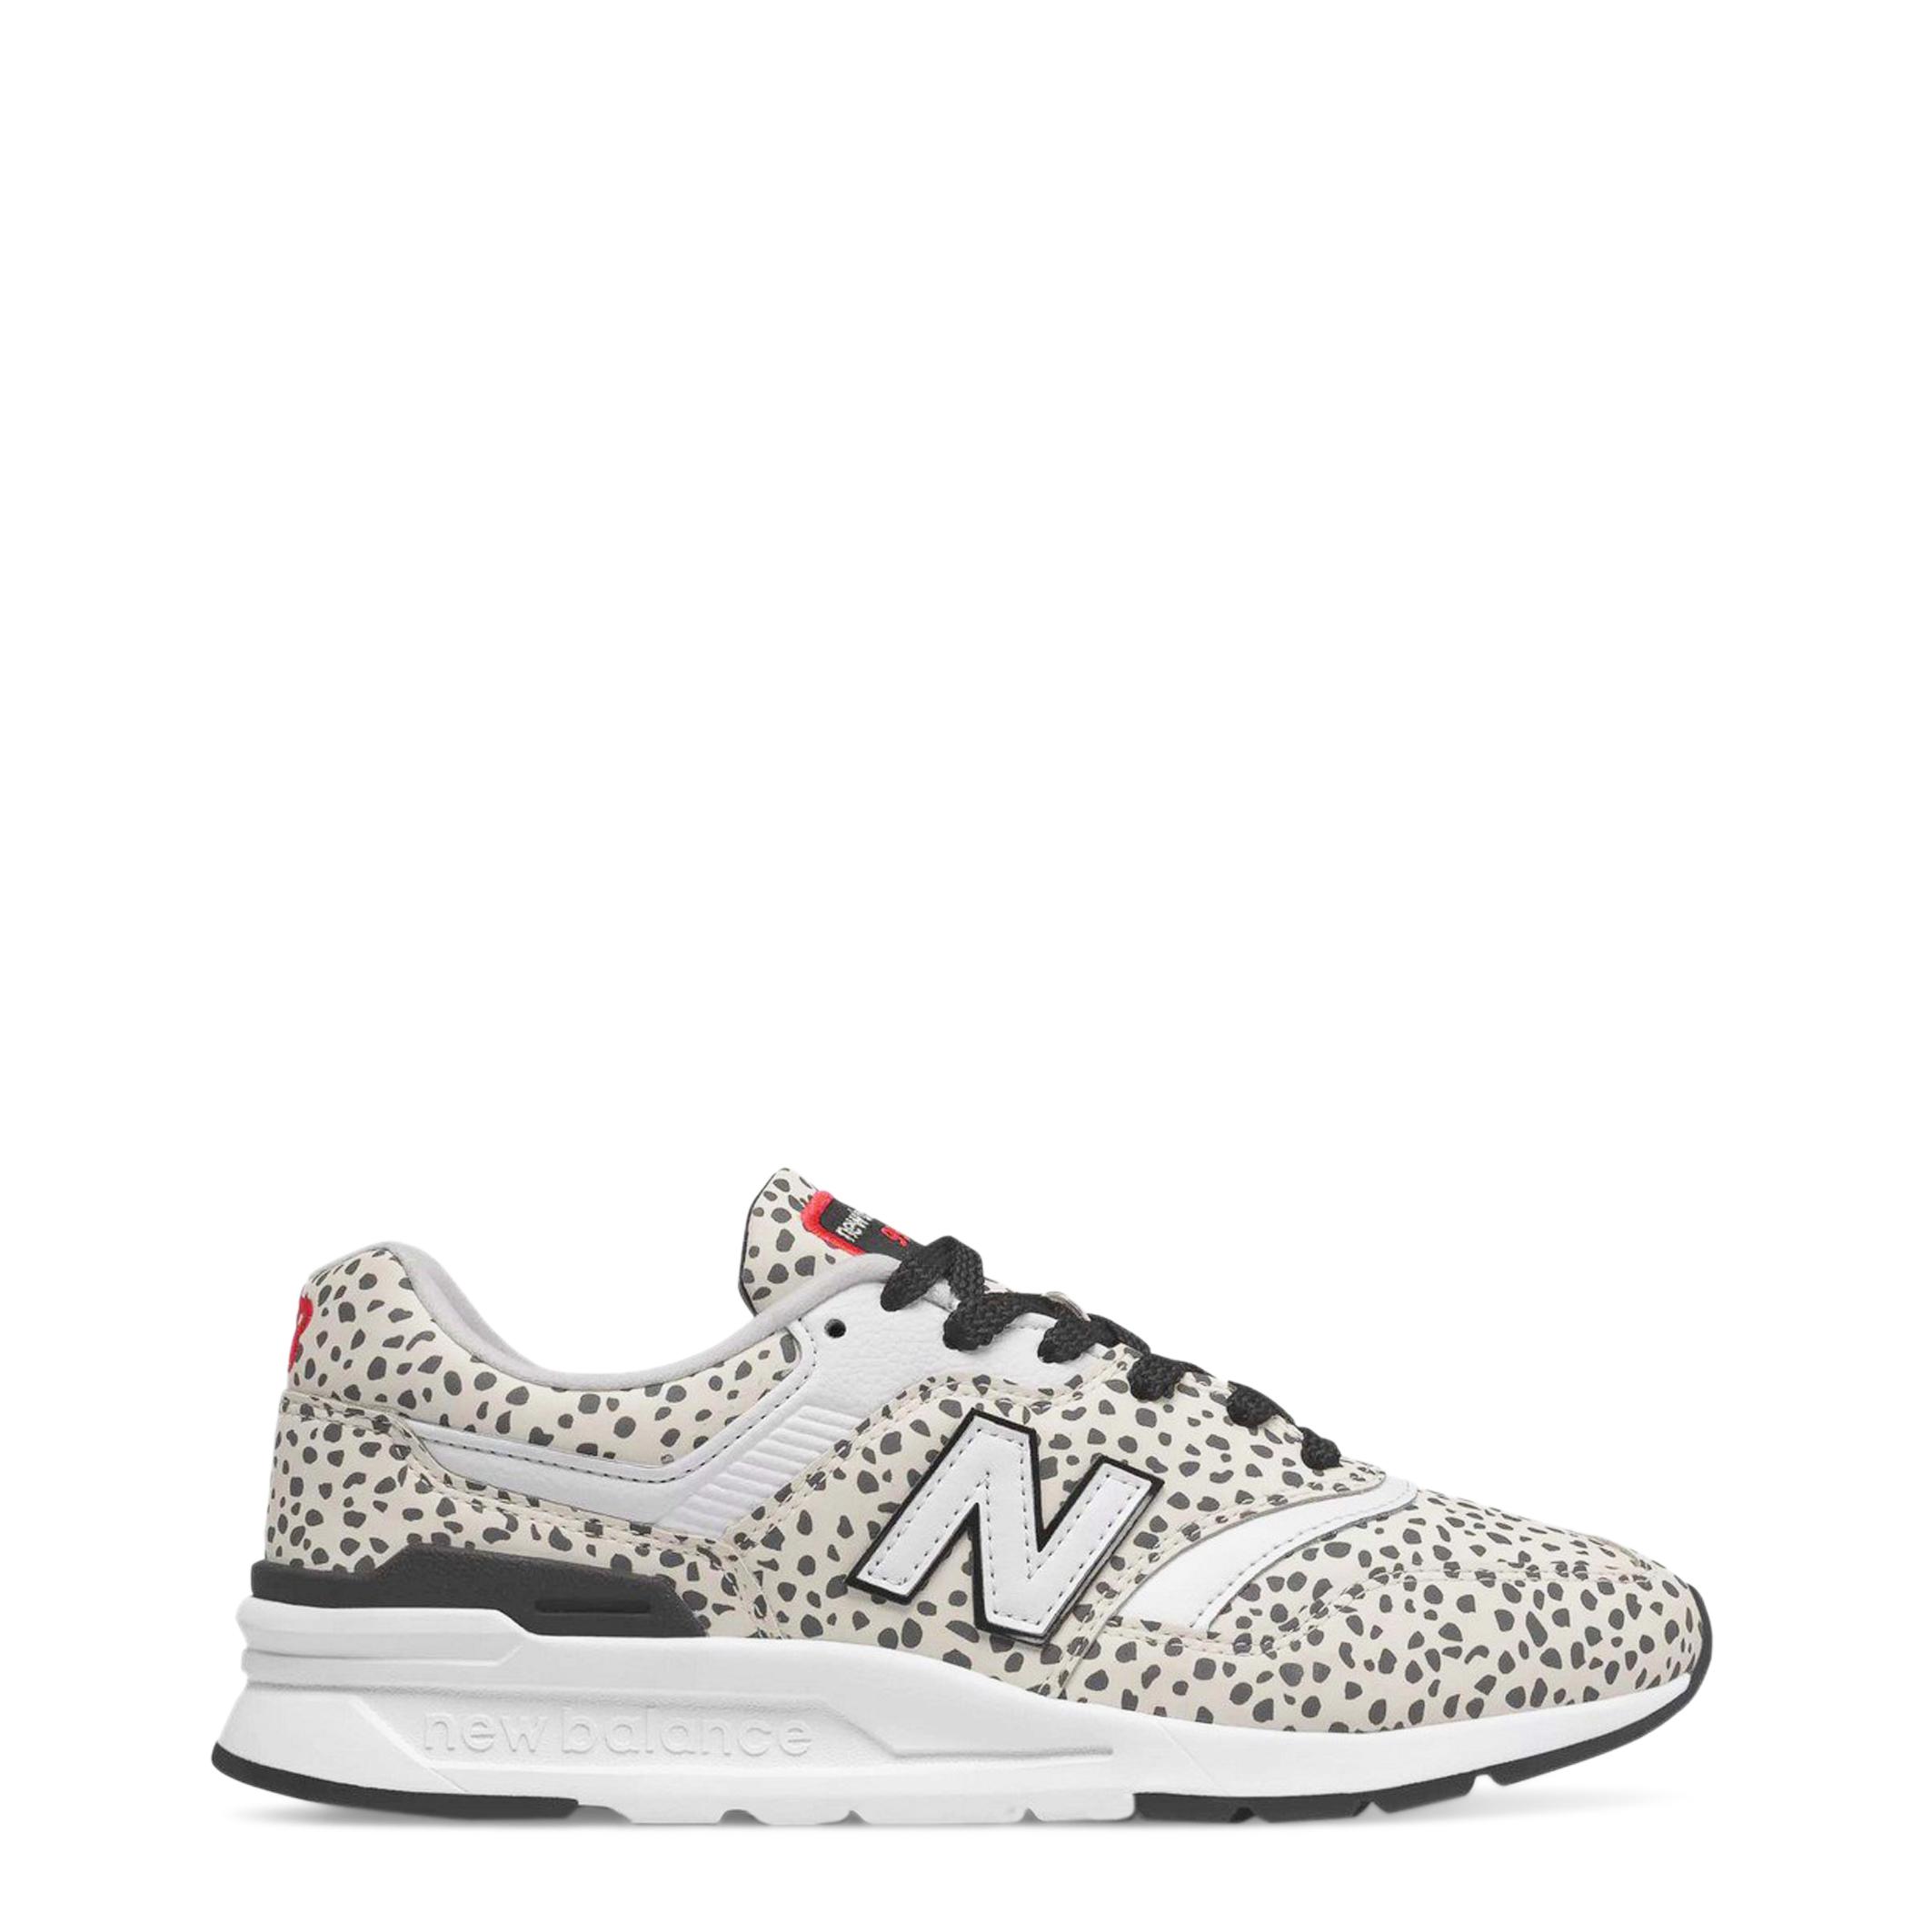 New Balance CW997